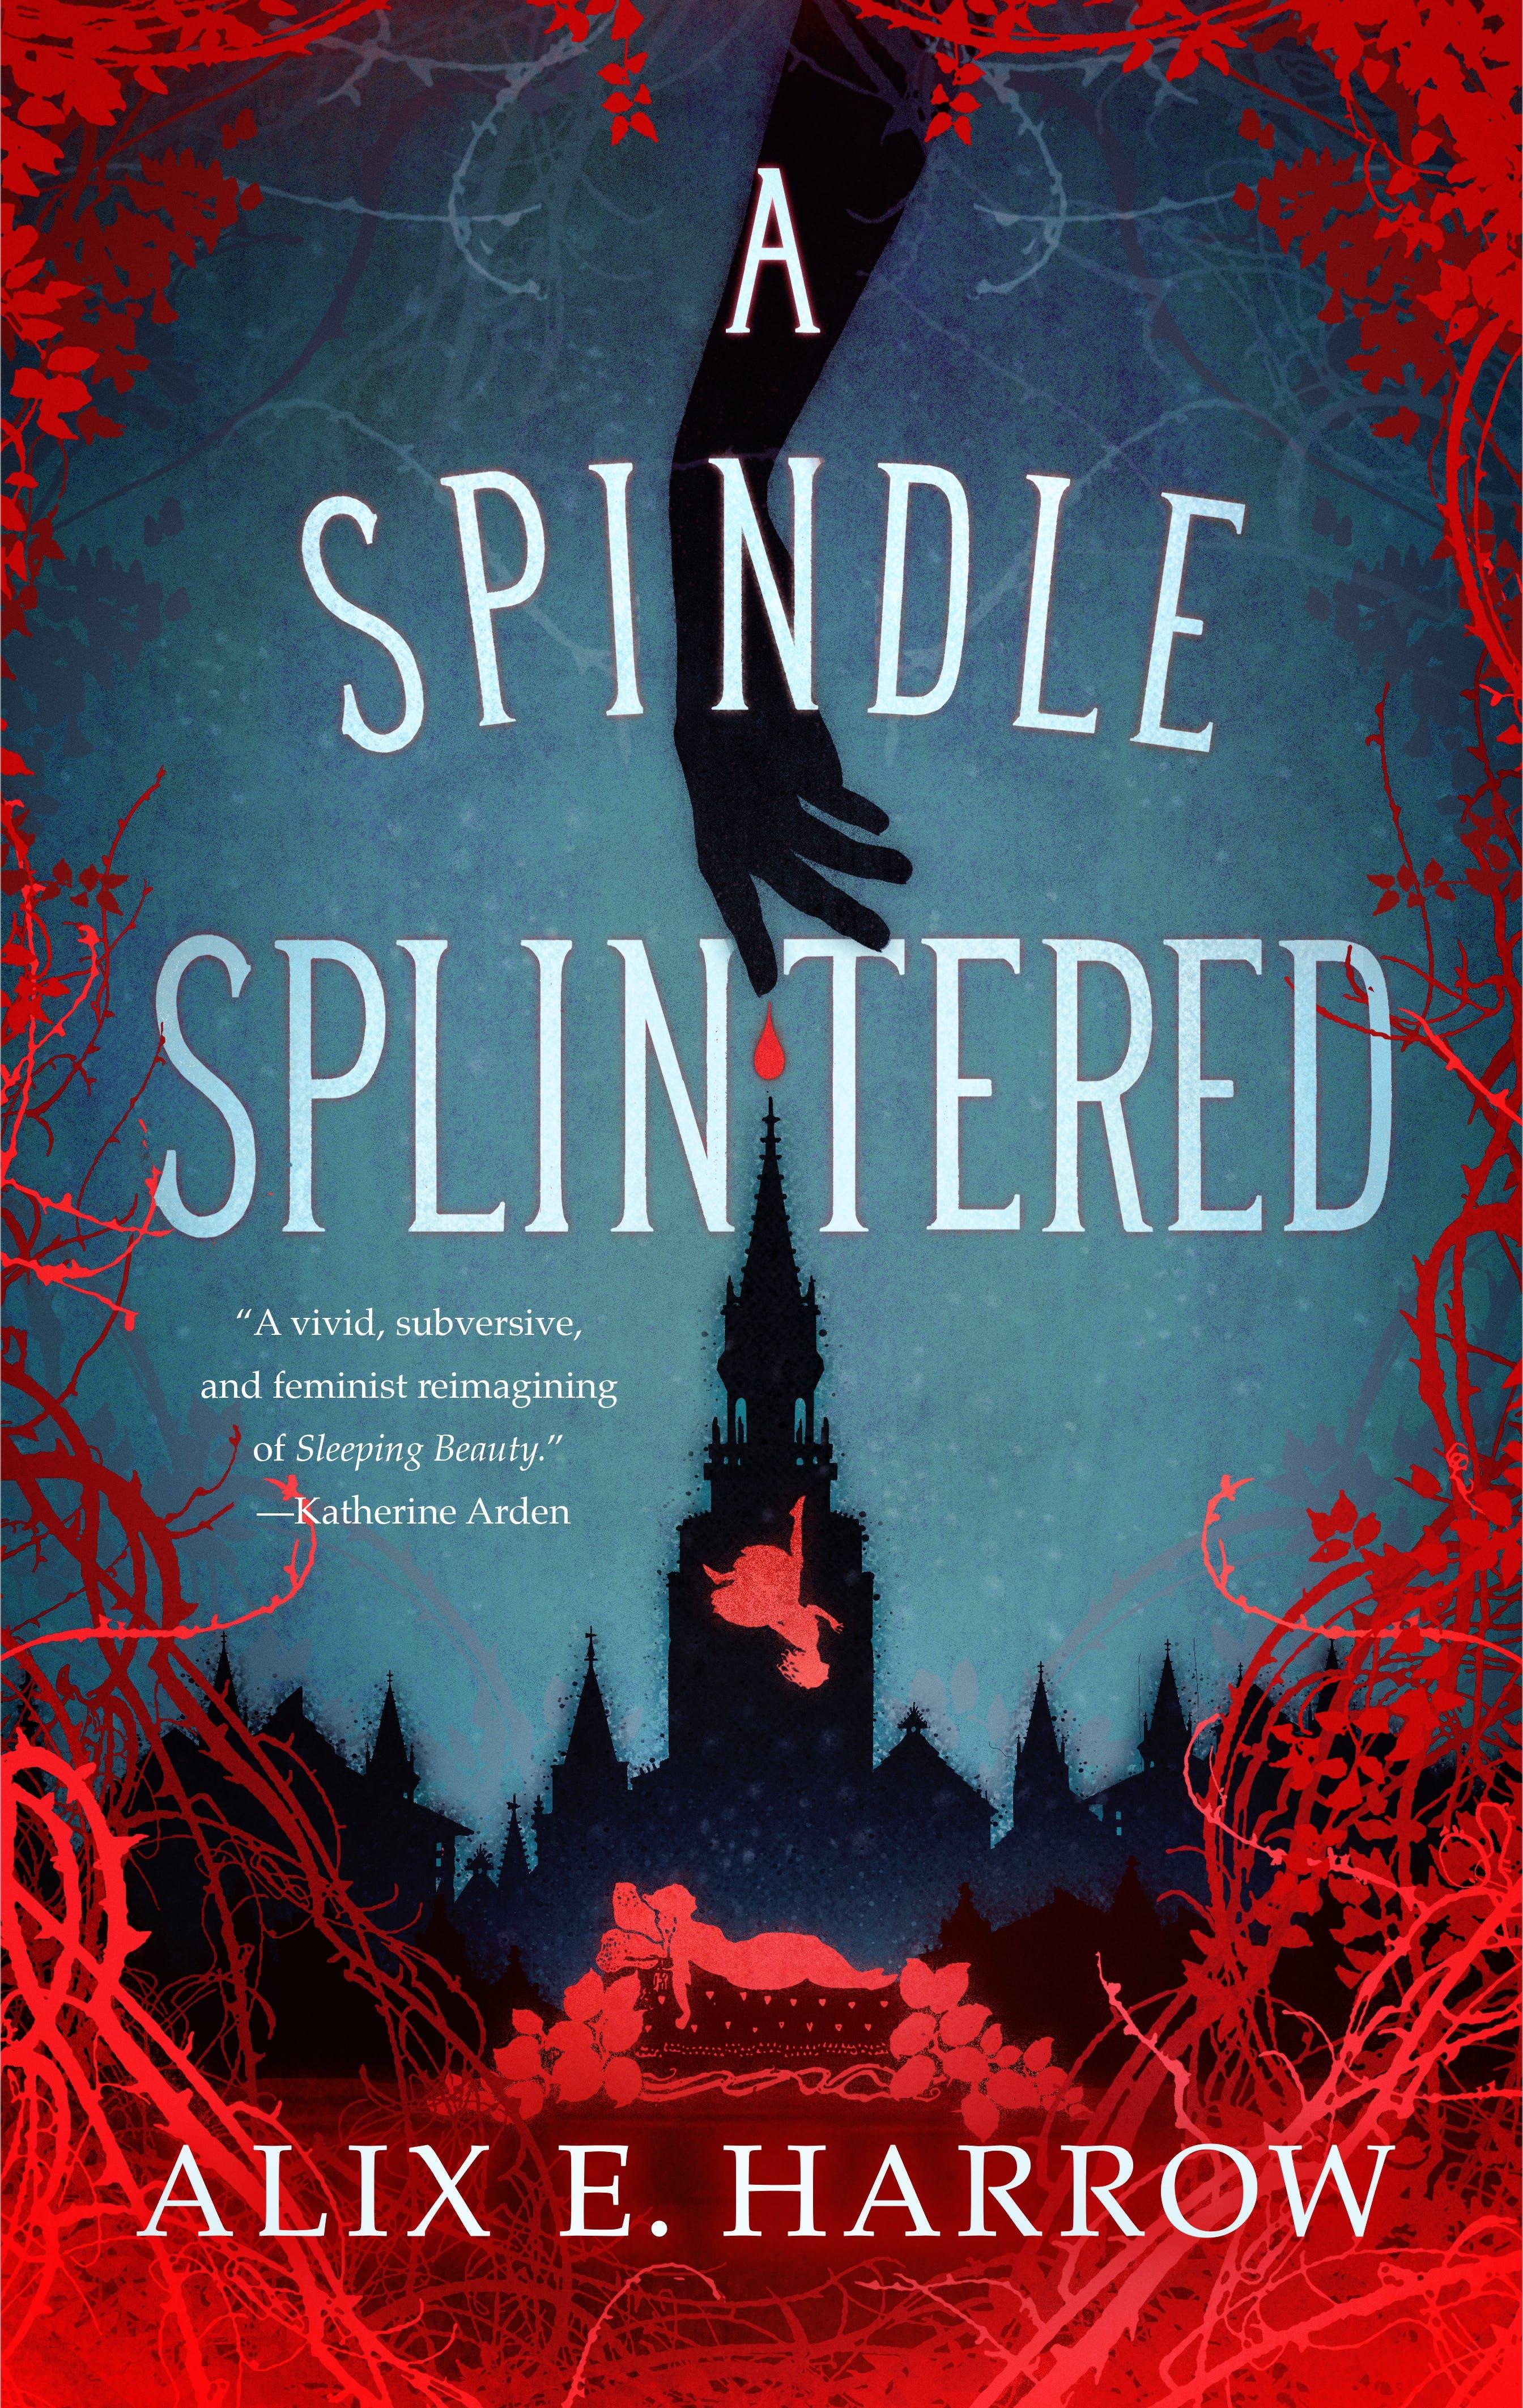 Image of A Spindle Splintered